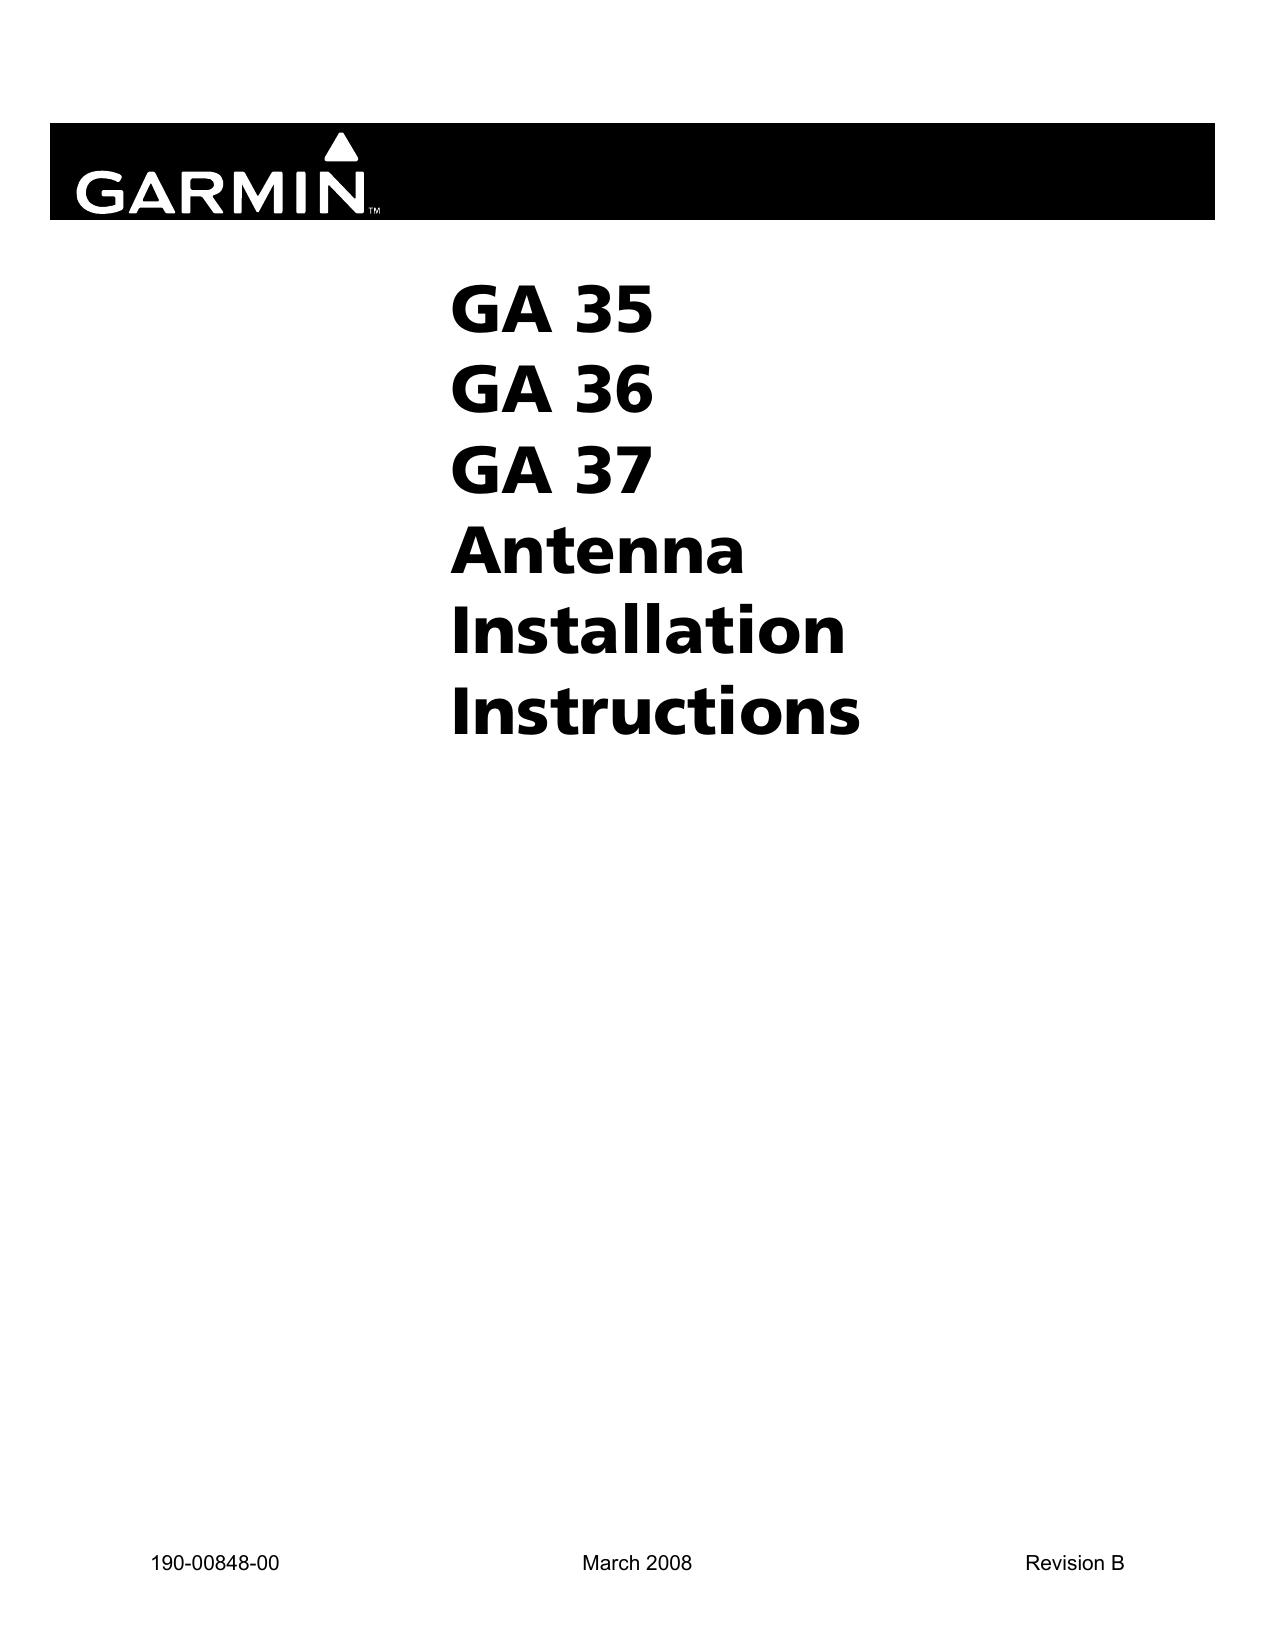 GA 35 GA 36 GA 37 Antenna Installation Instructions